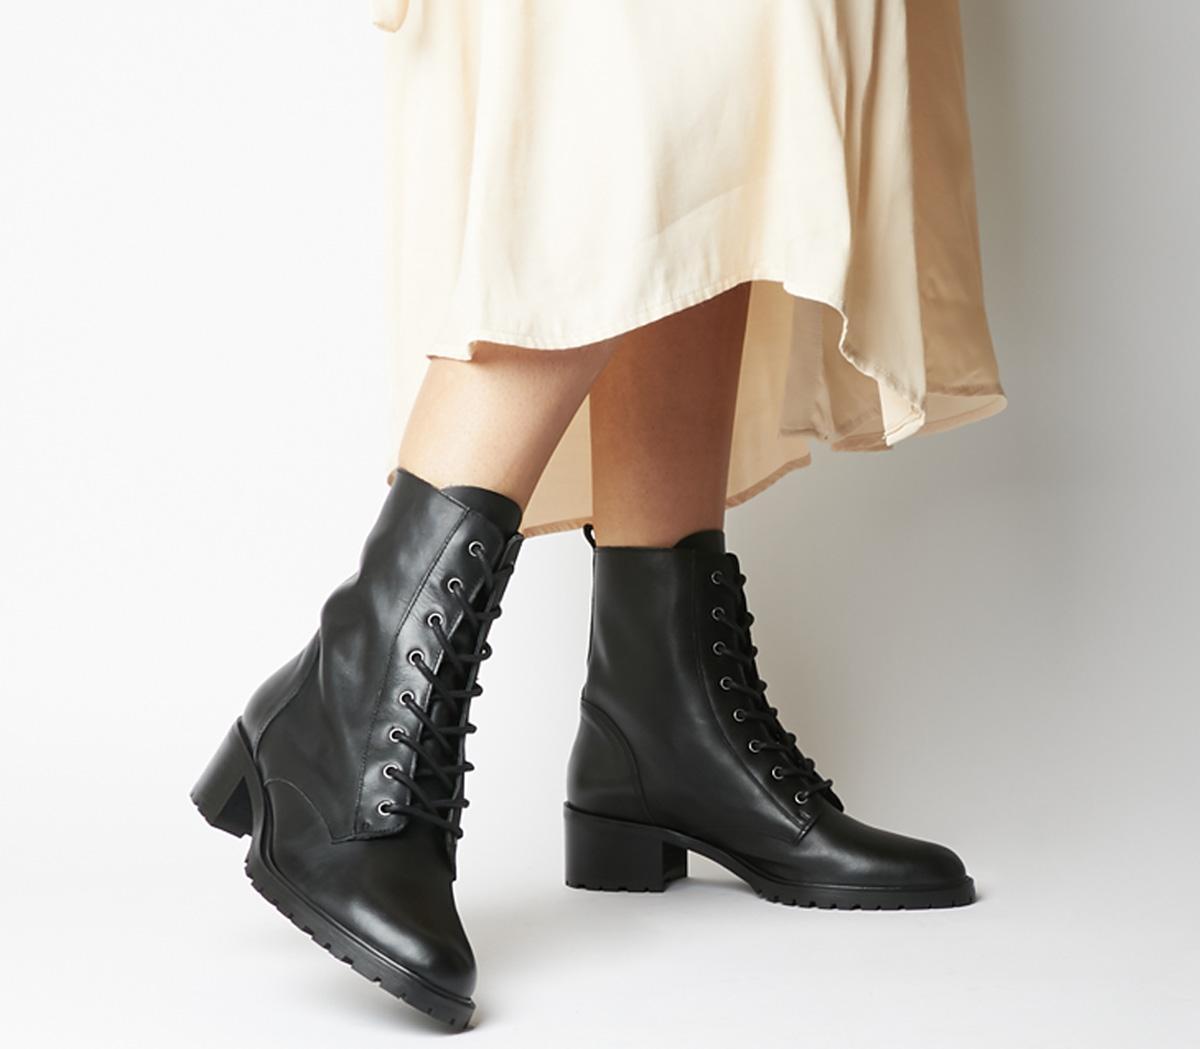 Office Azalea Lace Up Boots Black